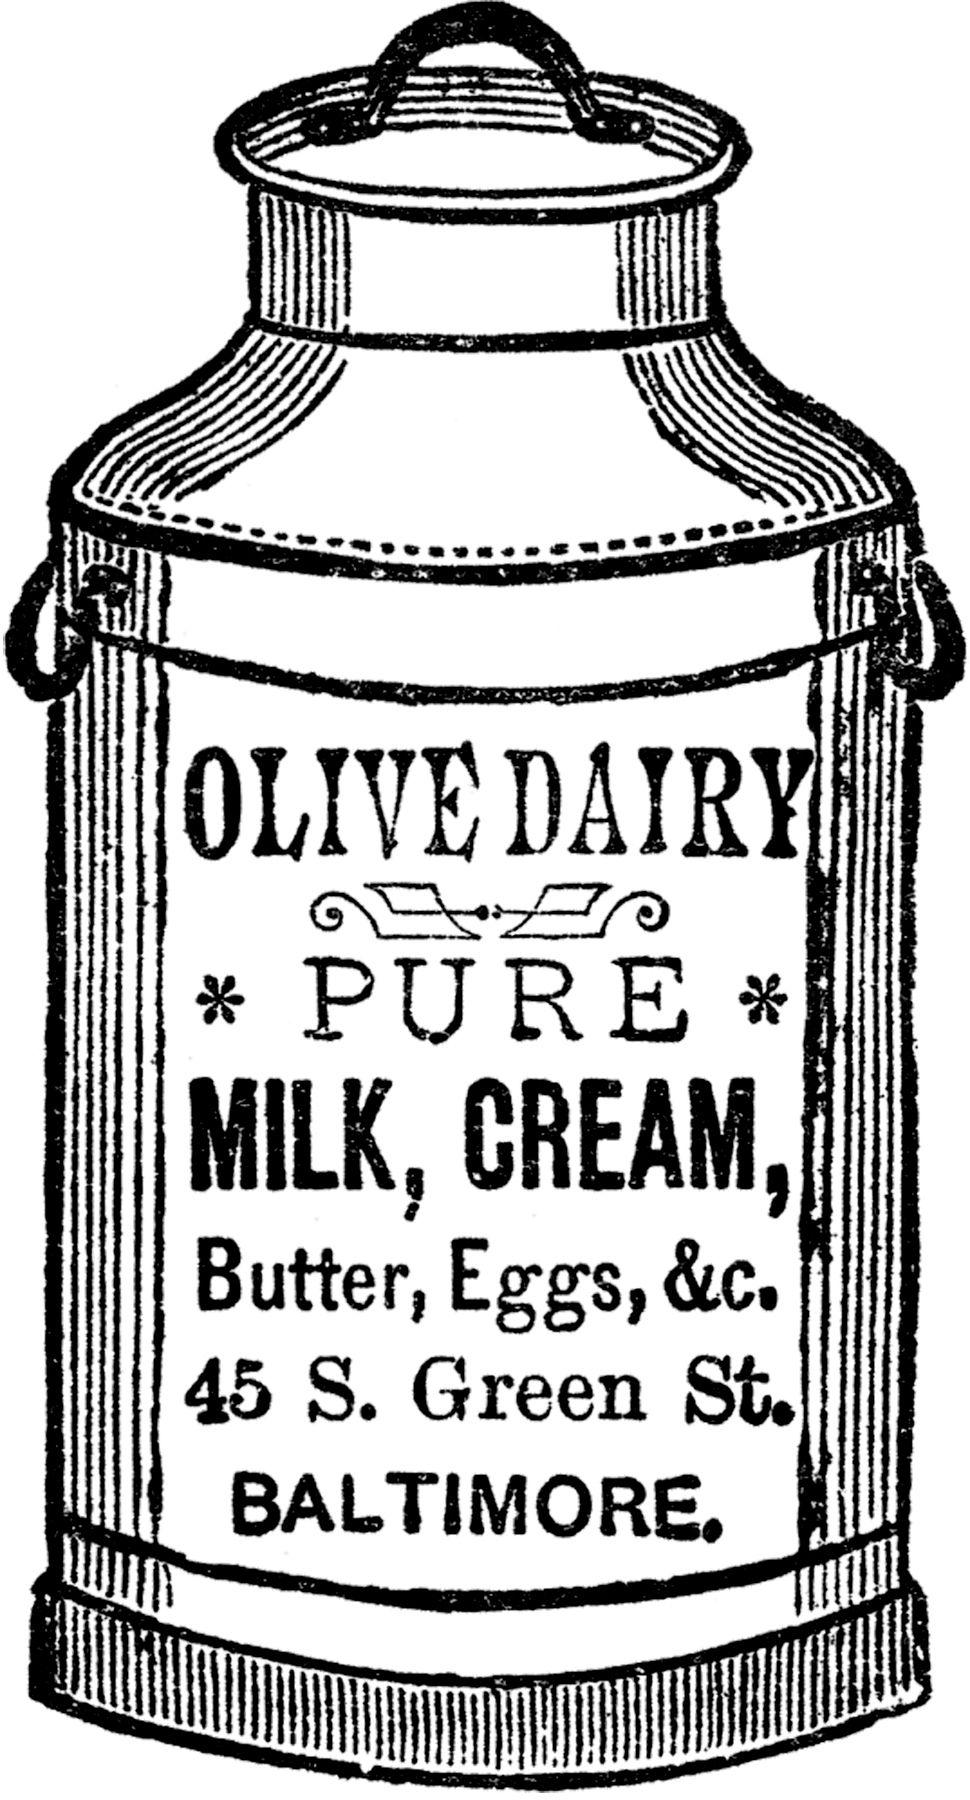 Cute Vintage Milk Can Image Vintage Milk Can Milk Cans Vintage Labels